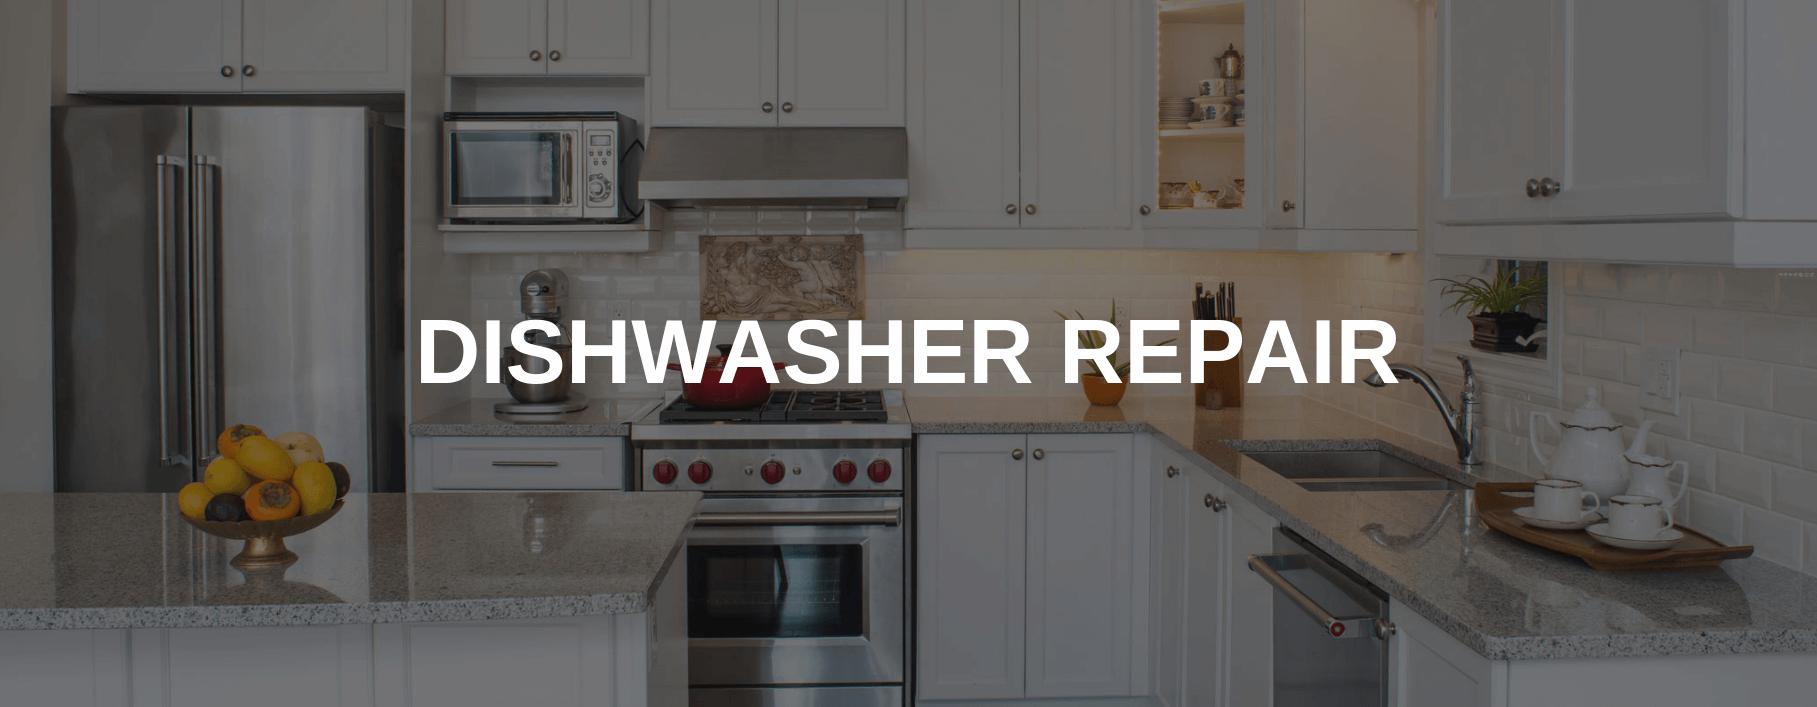 dishwasher repair waterbury